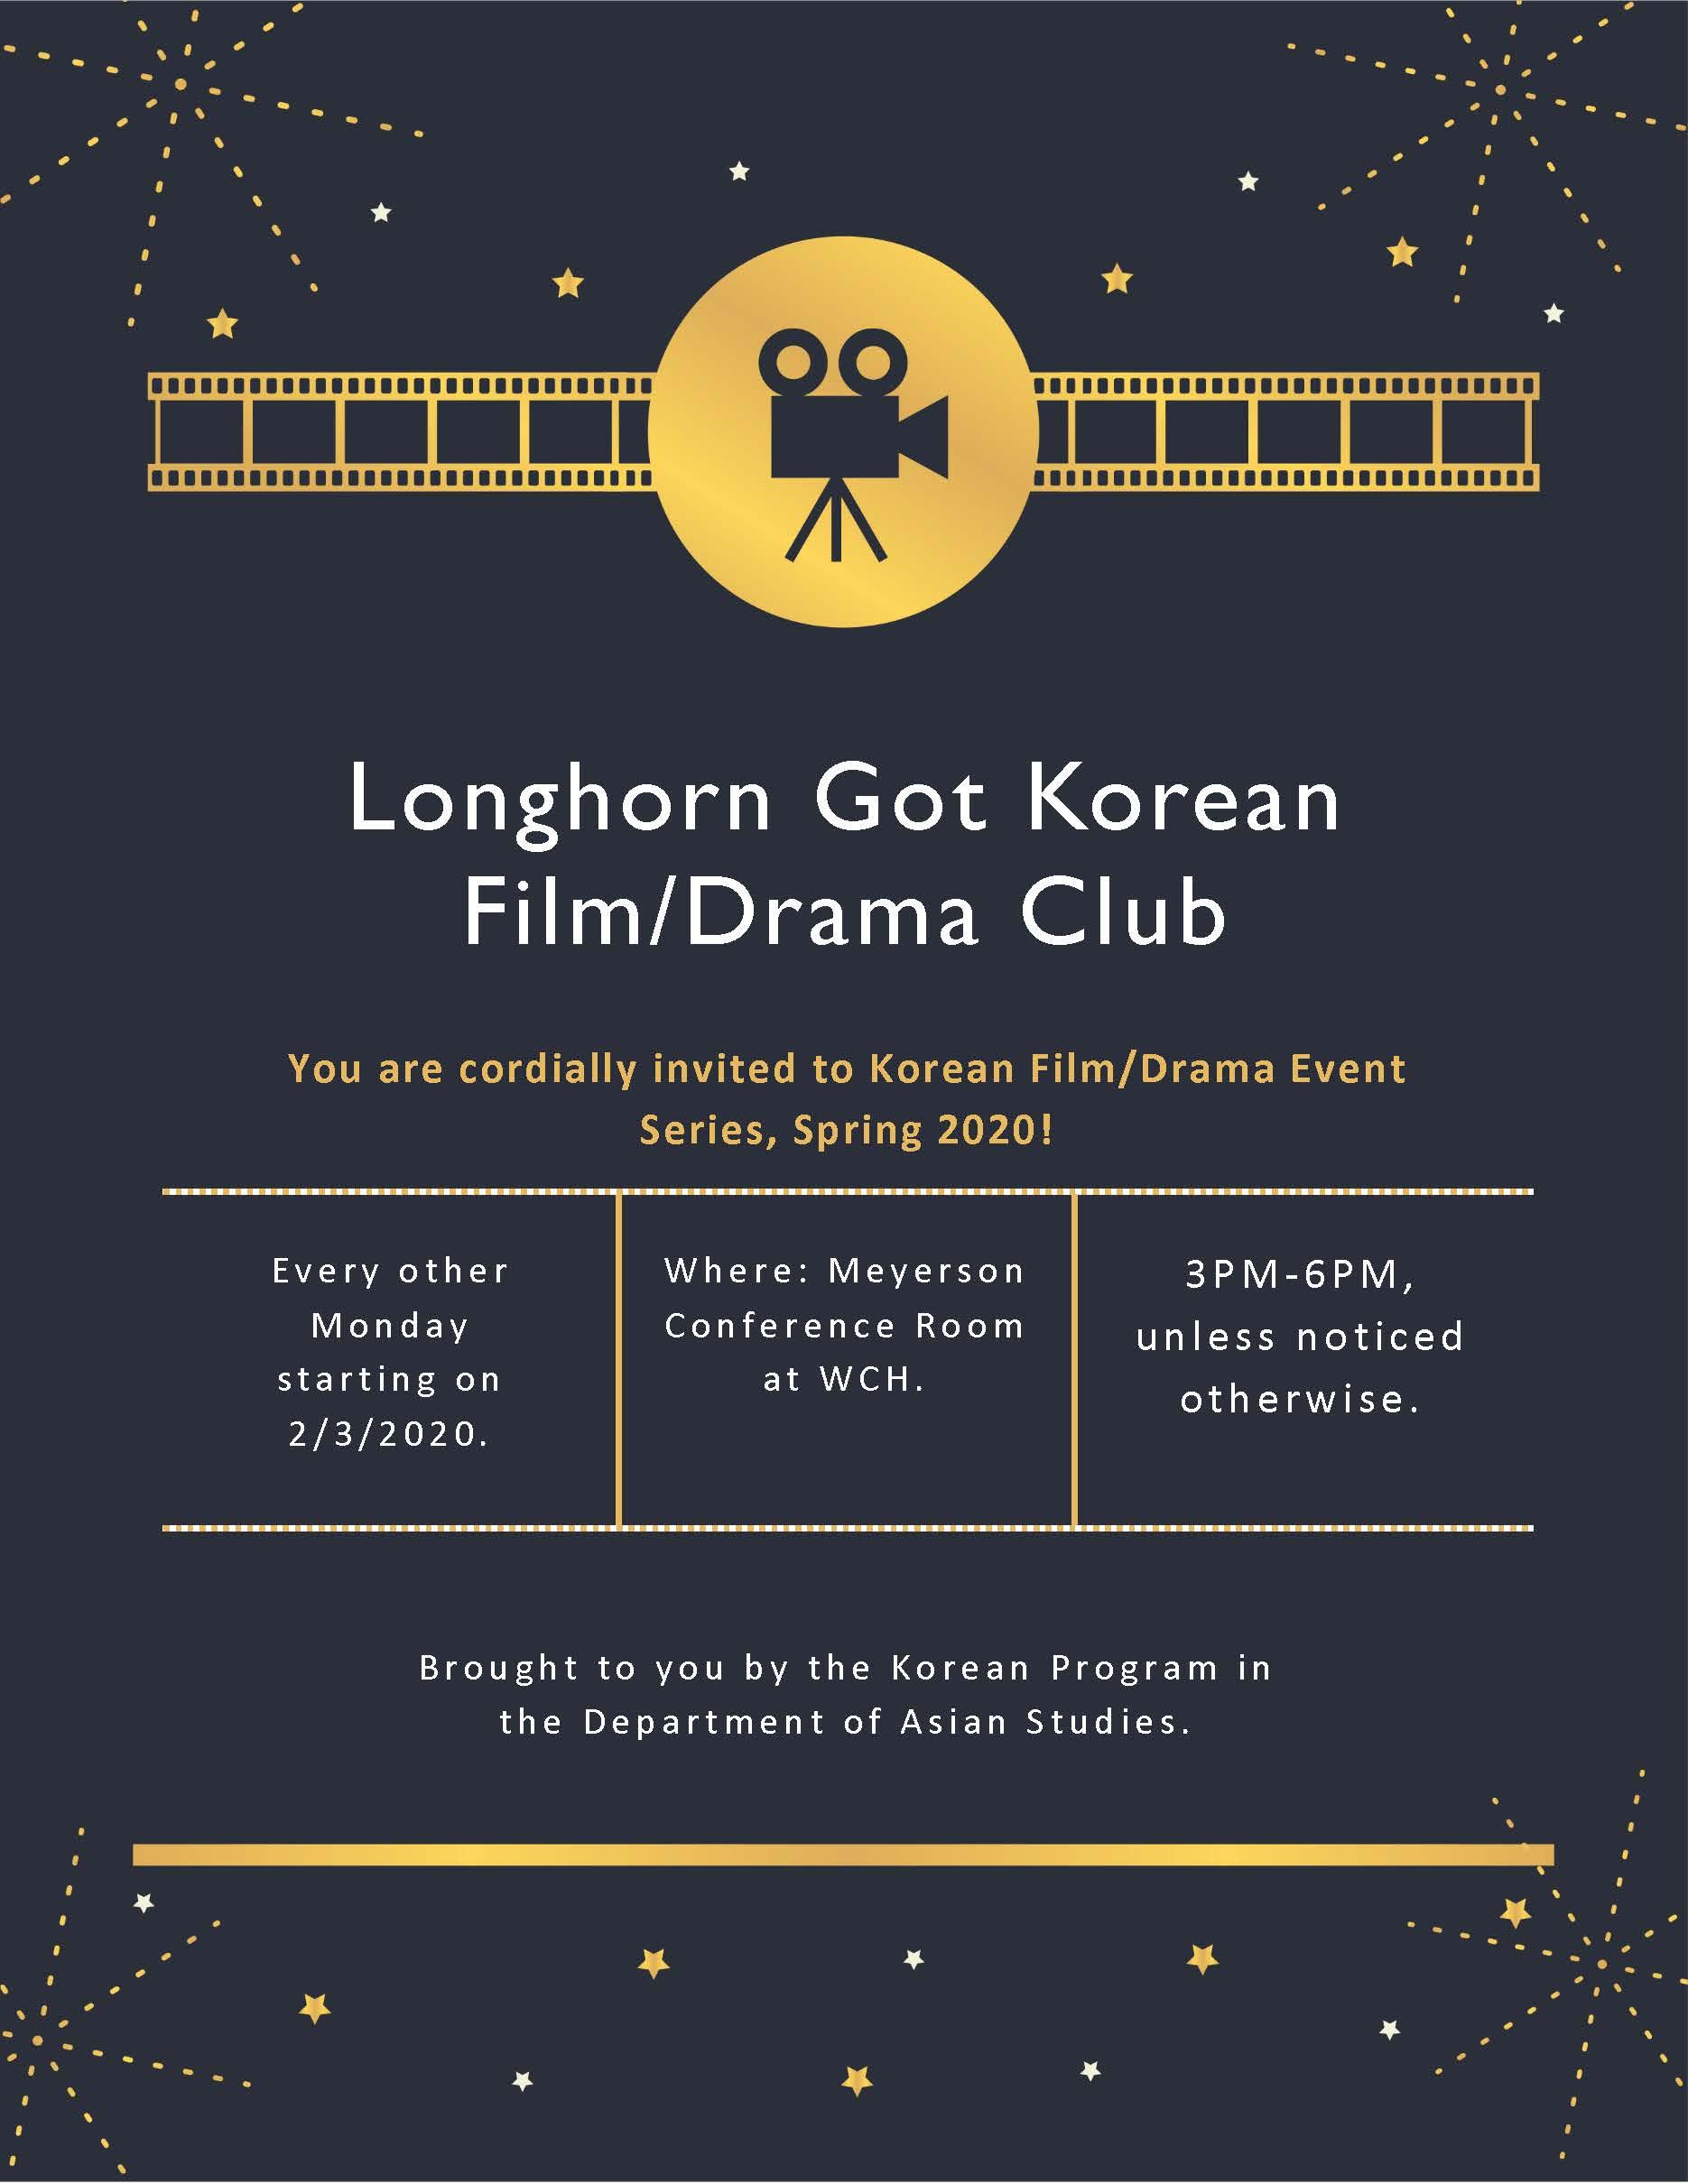 Longhorn Got Korean Film/Drama Club